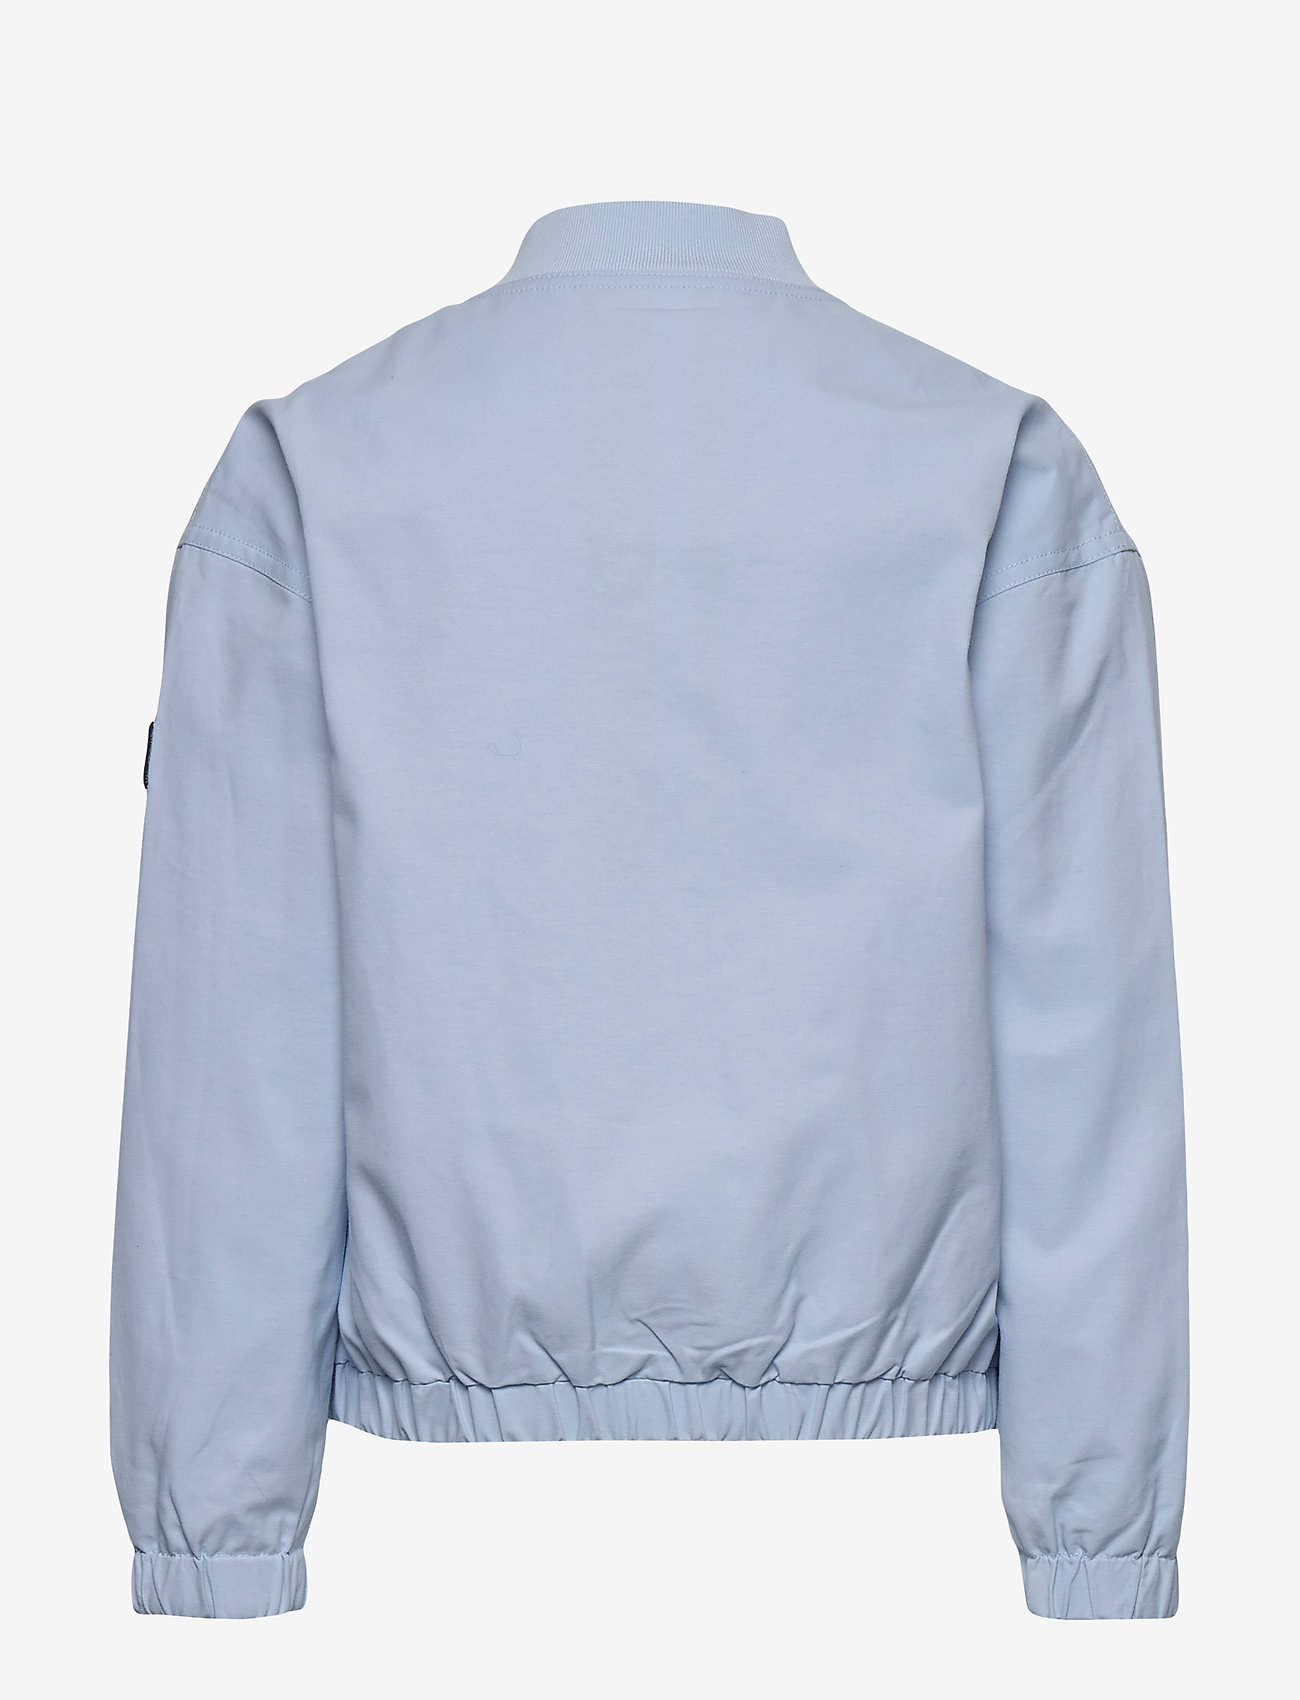 Tommy Hilfiger - TOMMY UTILITY BOMBER JACKET - bomber jackets - calm blue - 1